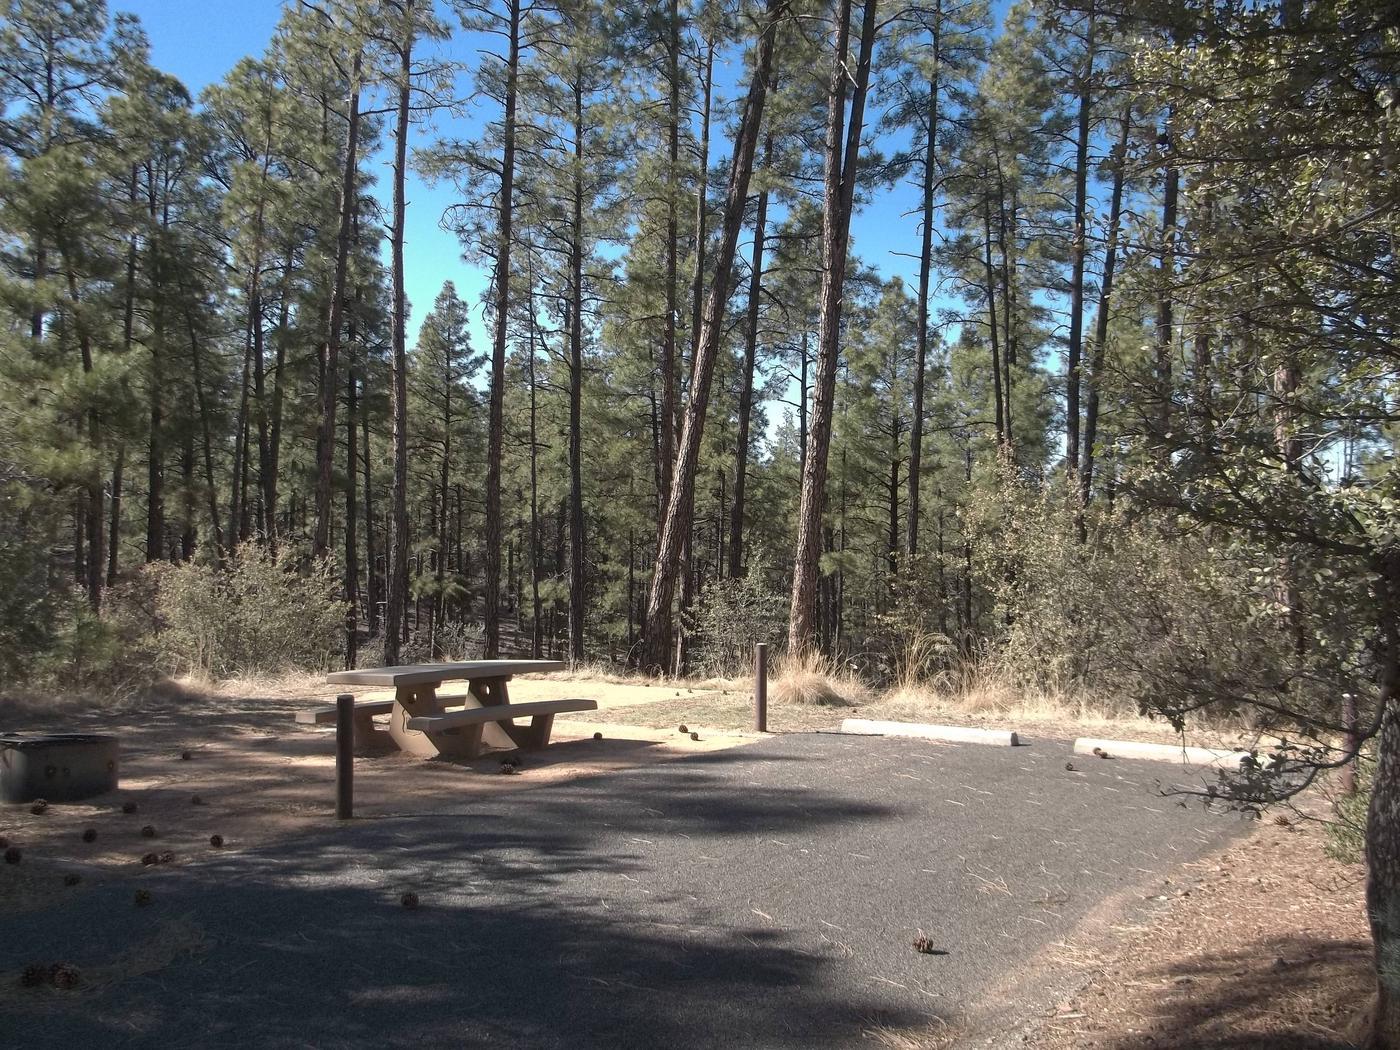 Hilltop Campground Campsite 36